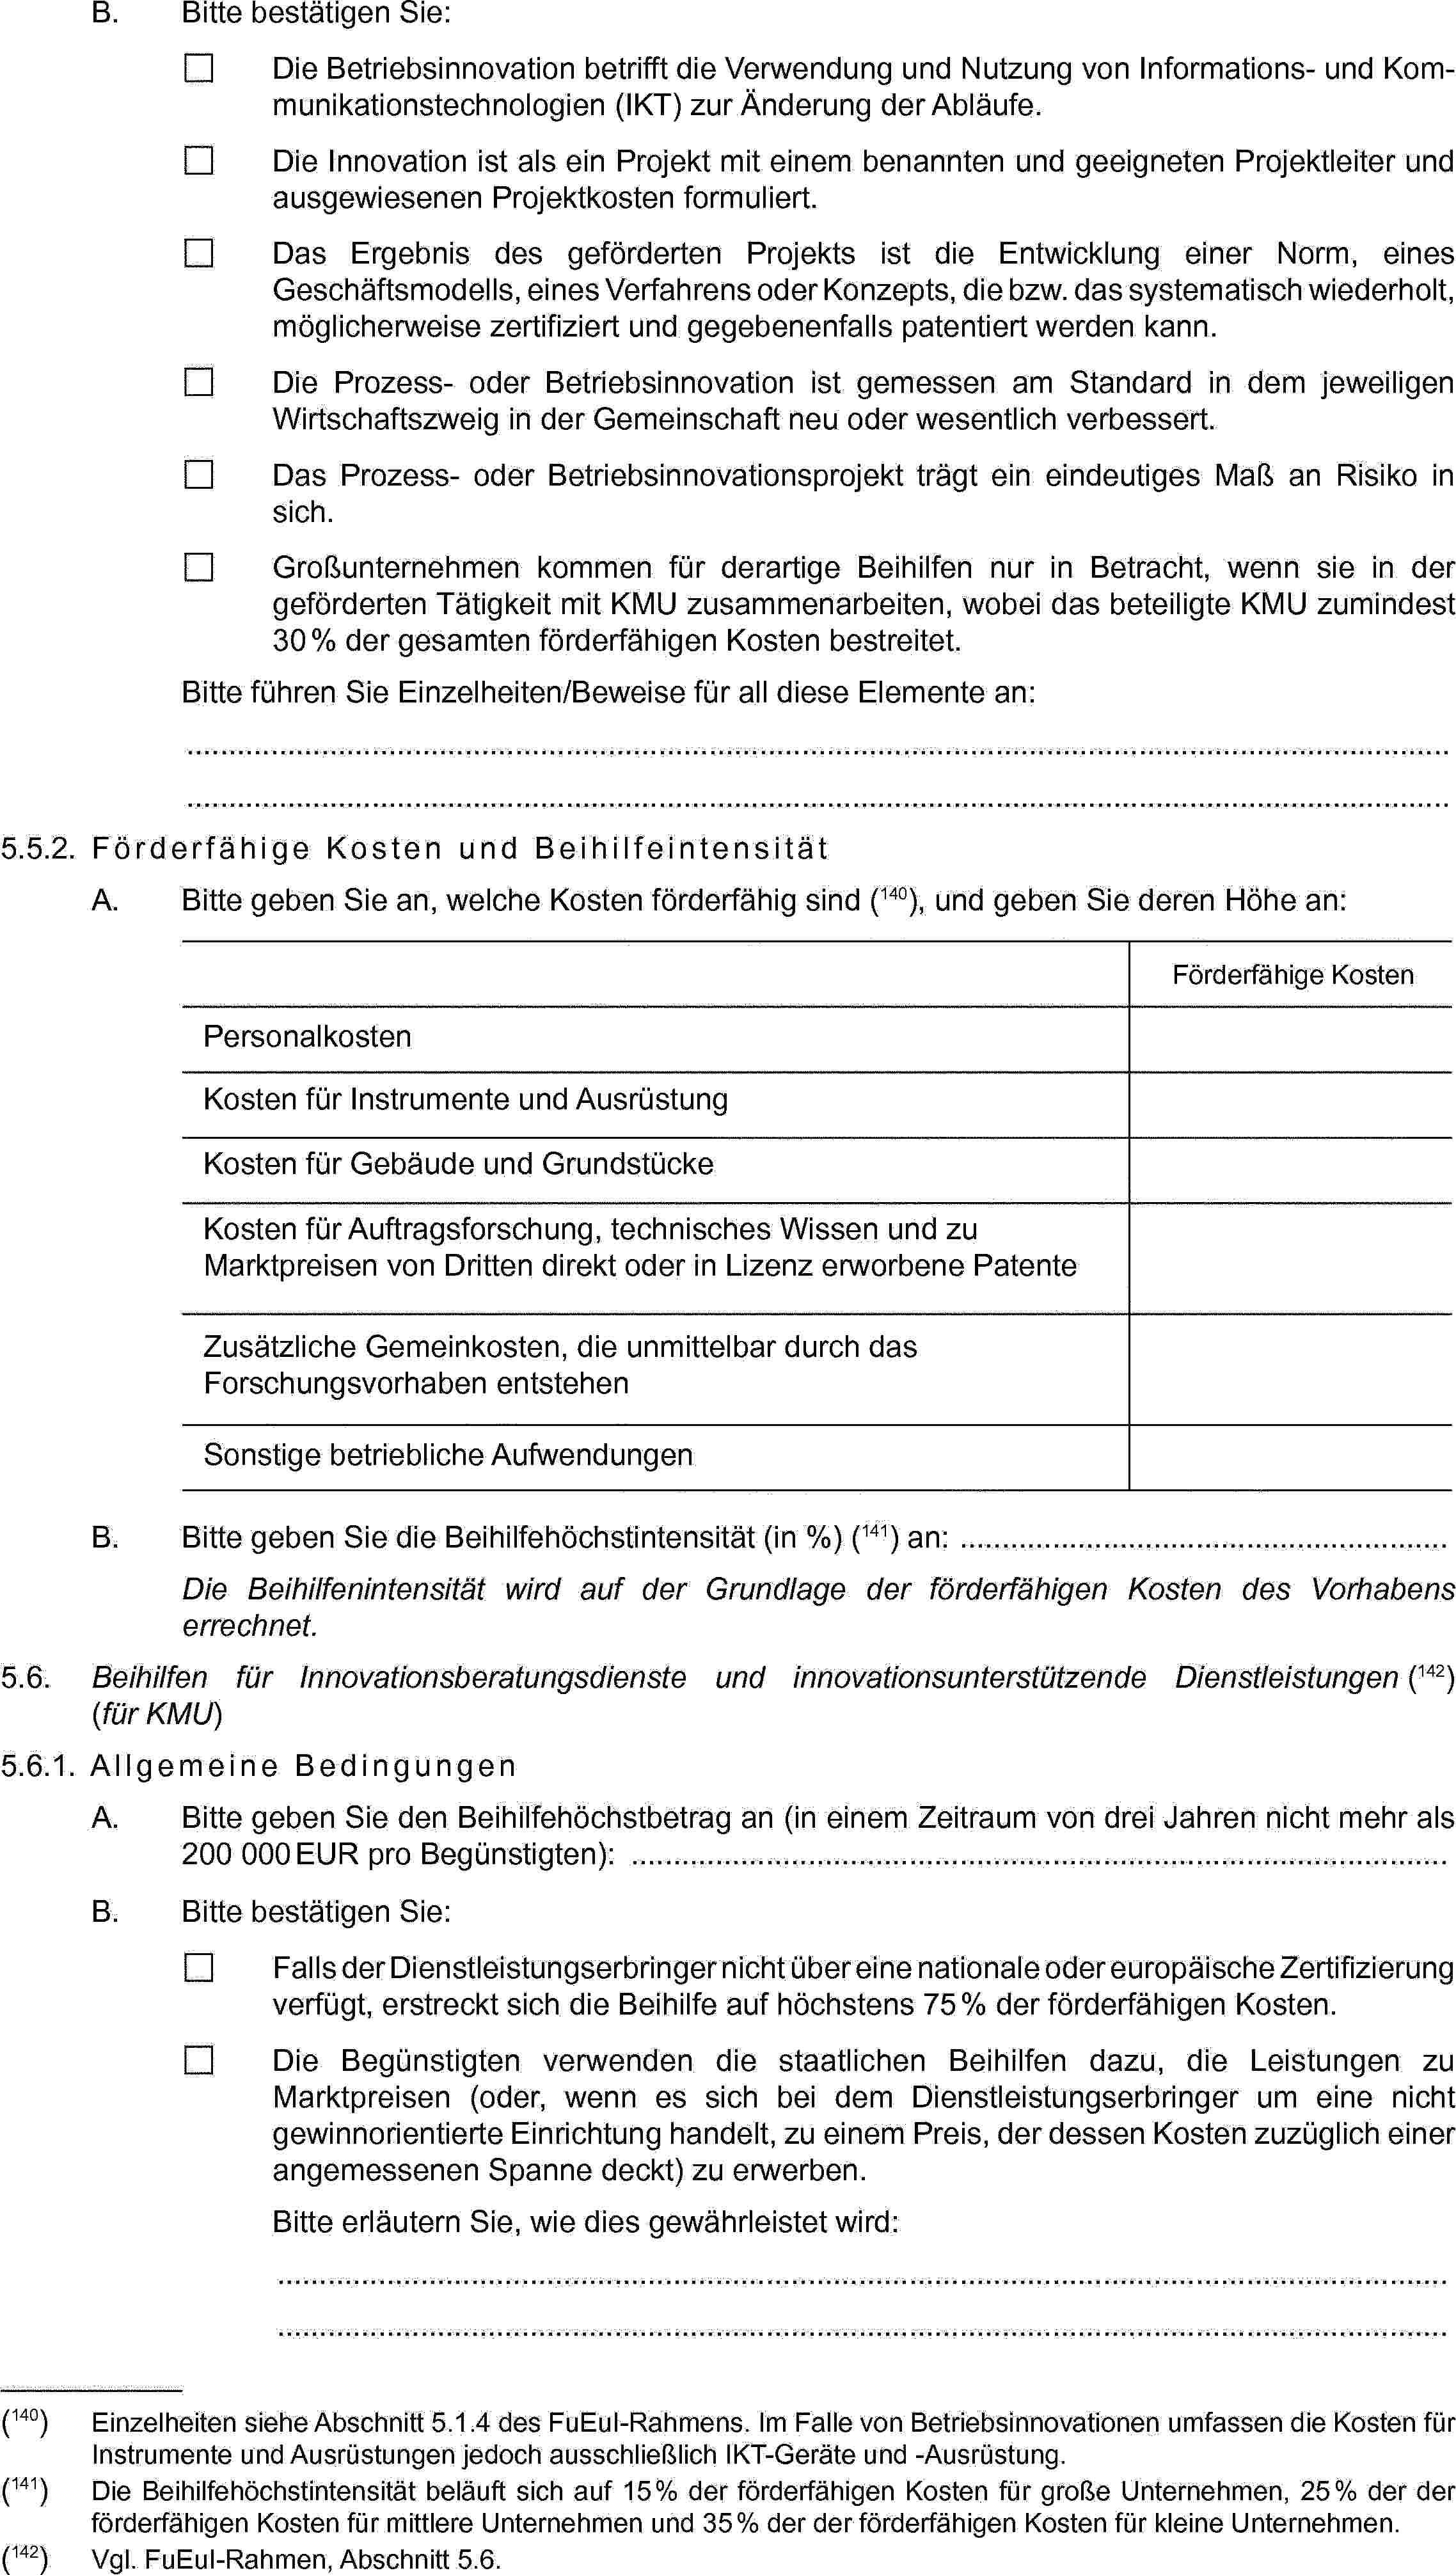 EUR-Lex - 02004R0794-20140502 - EN - EUR-Lex